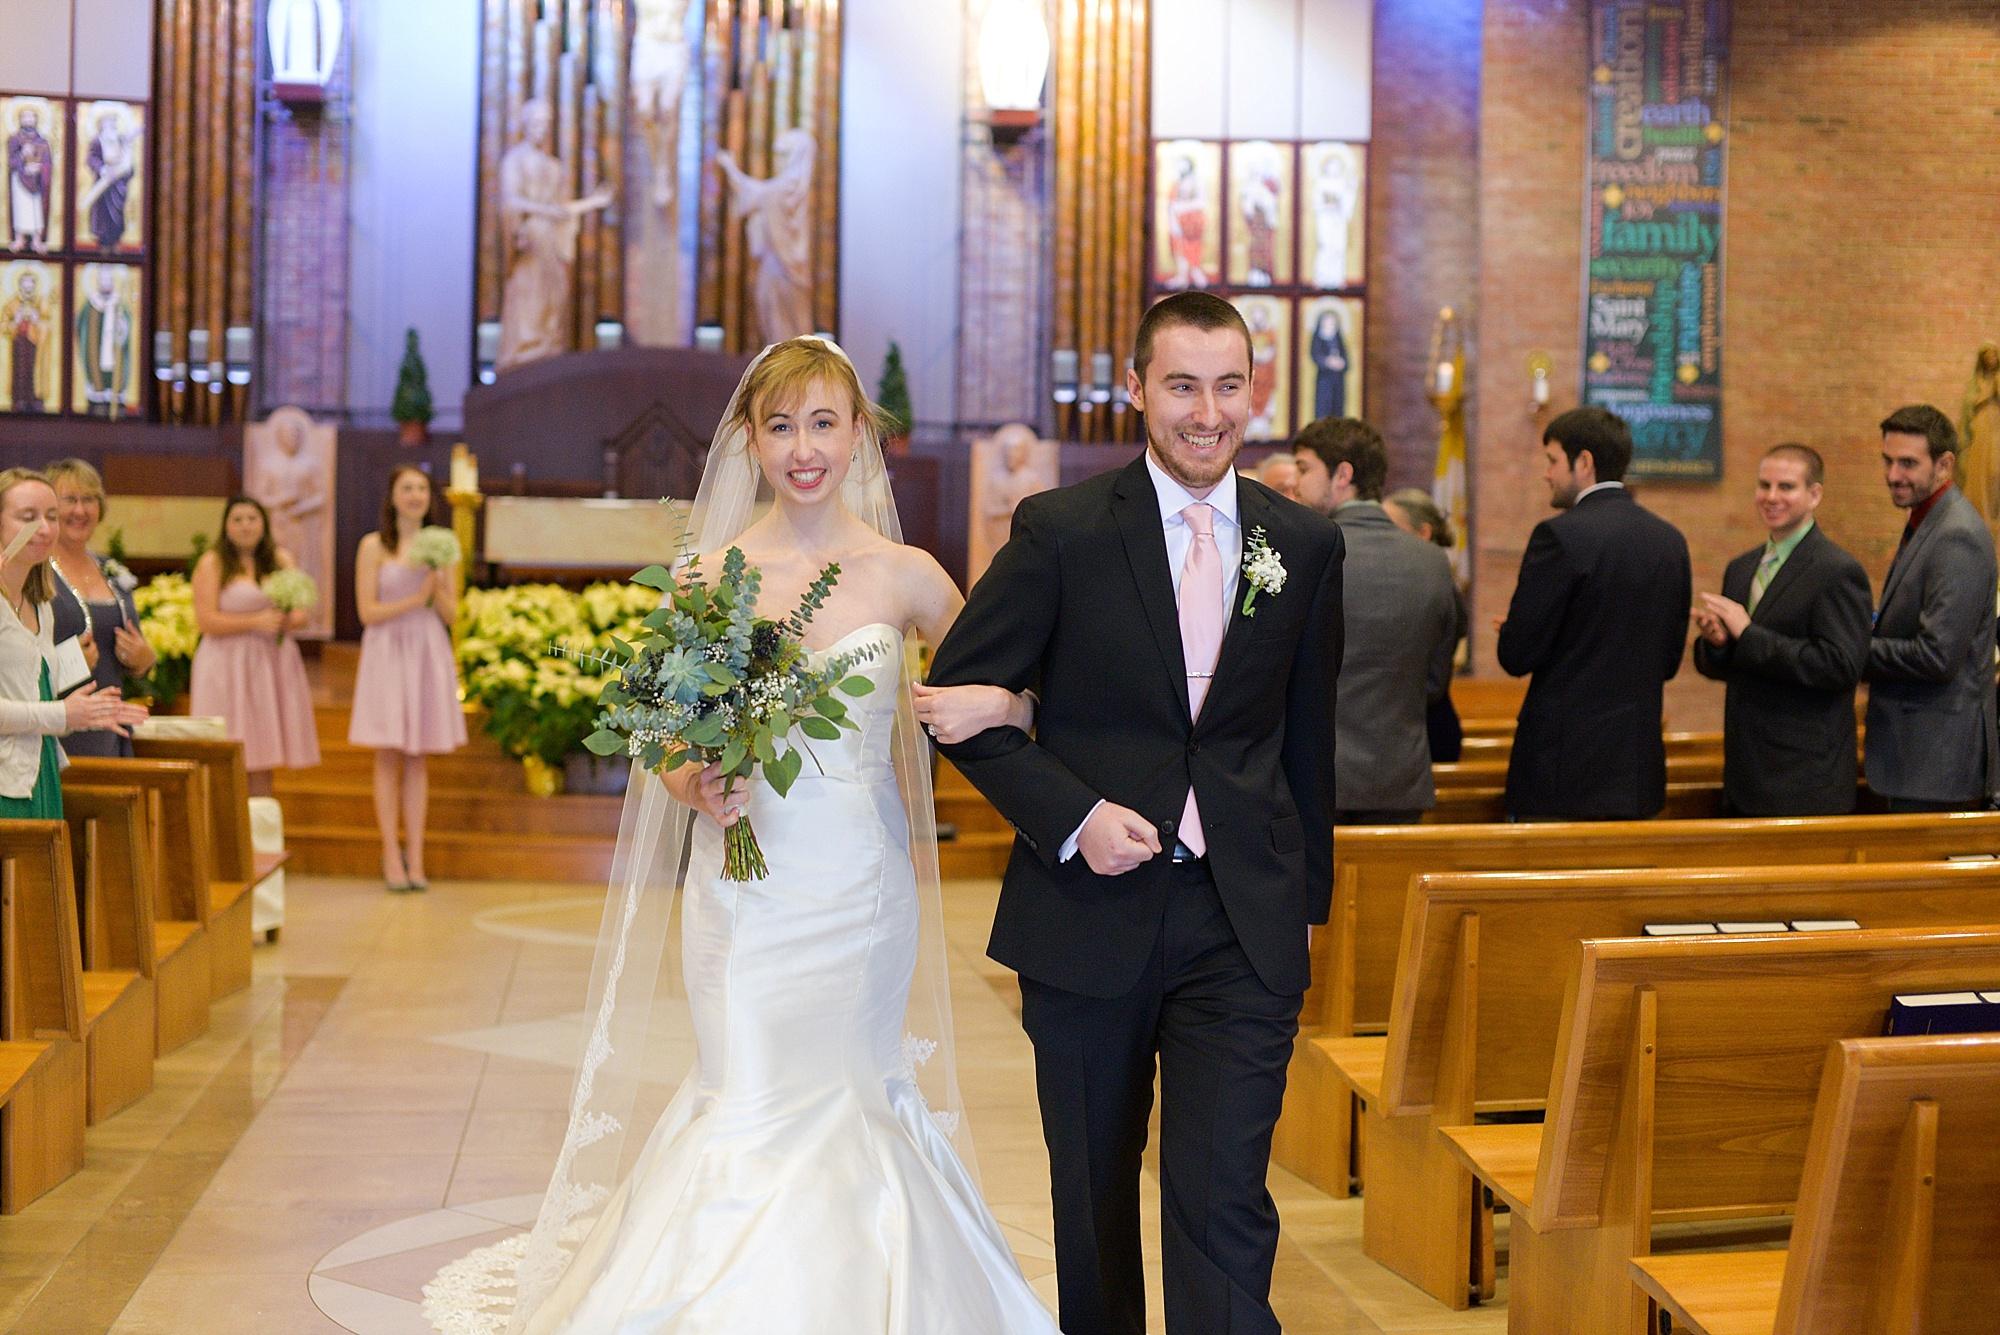 fredericksburg-wedding-church-mercantile_0022.jpg